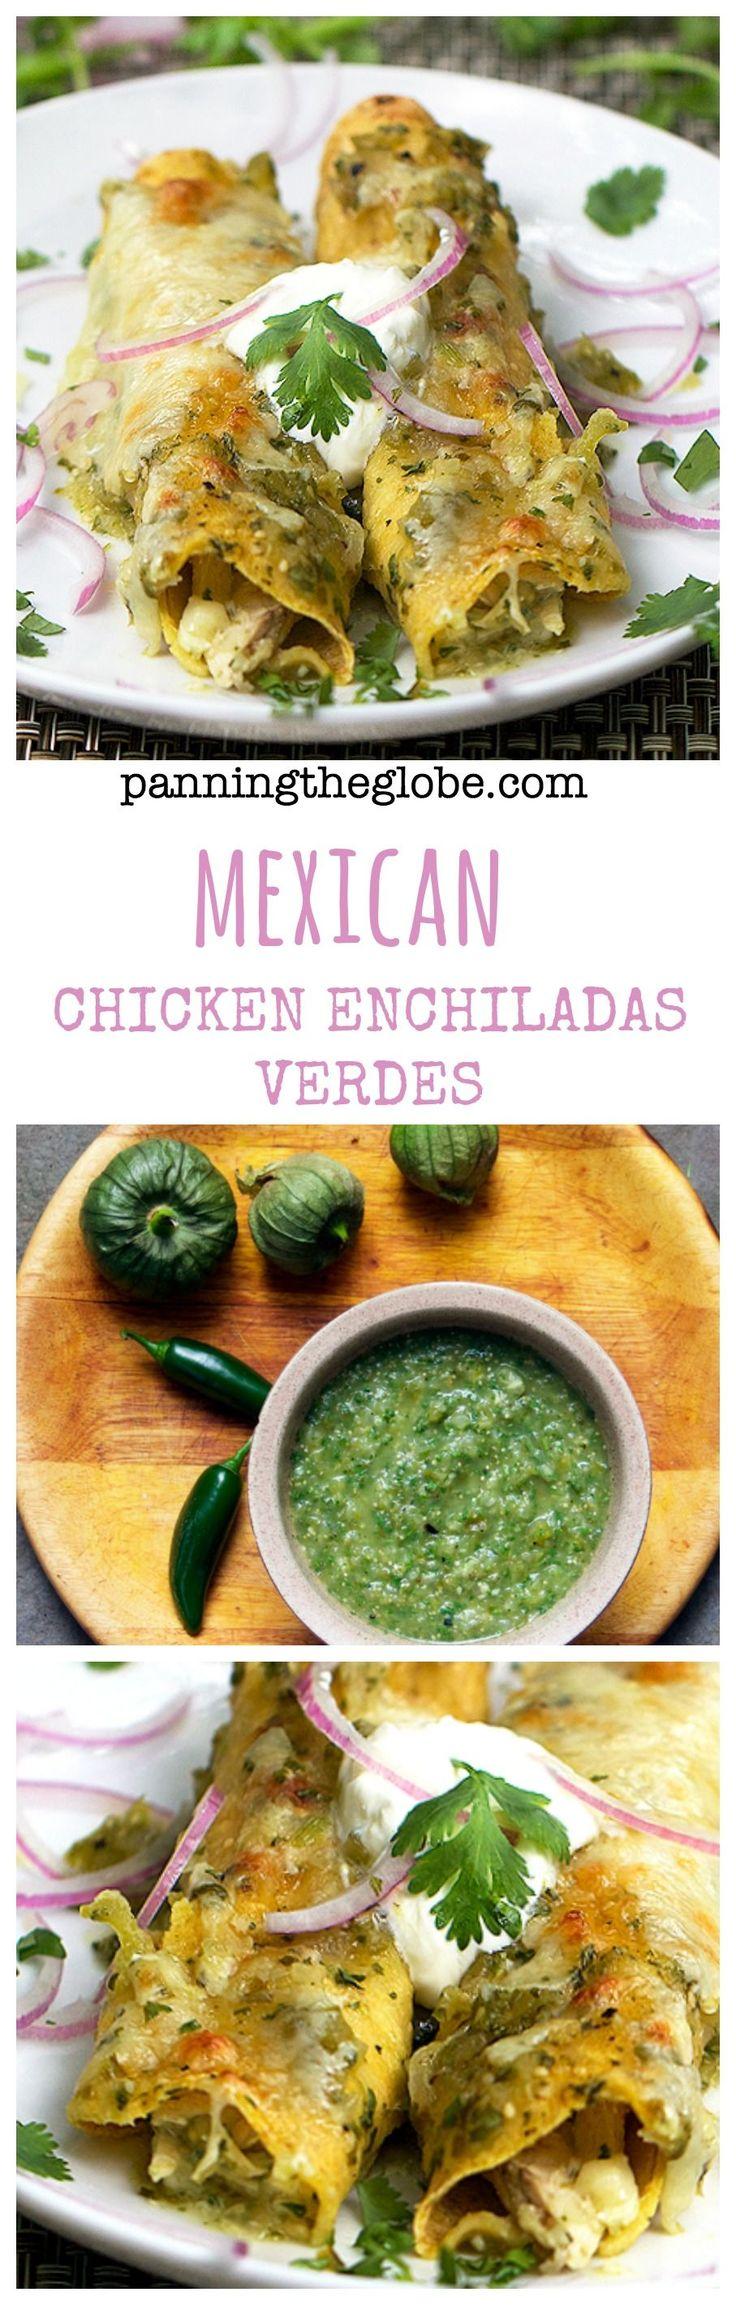 Chicken Enchiladas Verdes: Tender chicken, tangy roasted tomatillo salsa, melted cheese, rolled in a corn tortilla. #GlutenFree